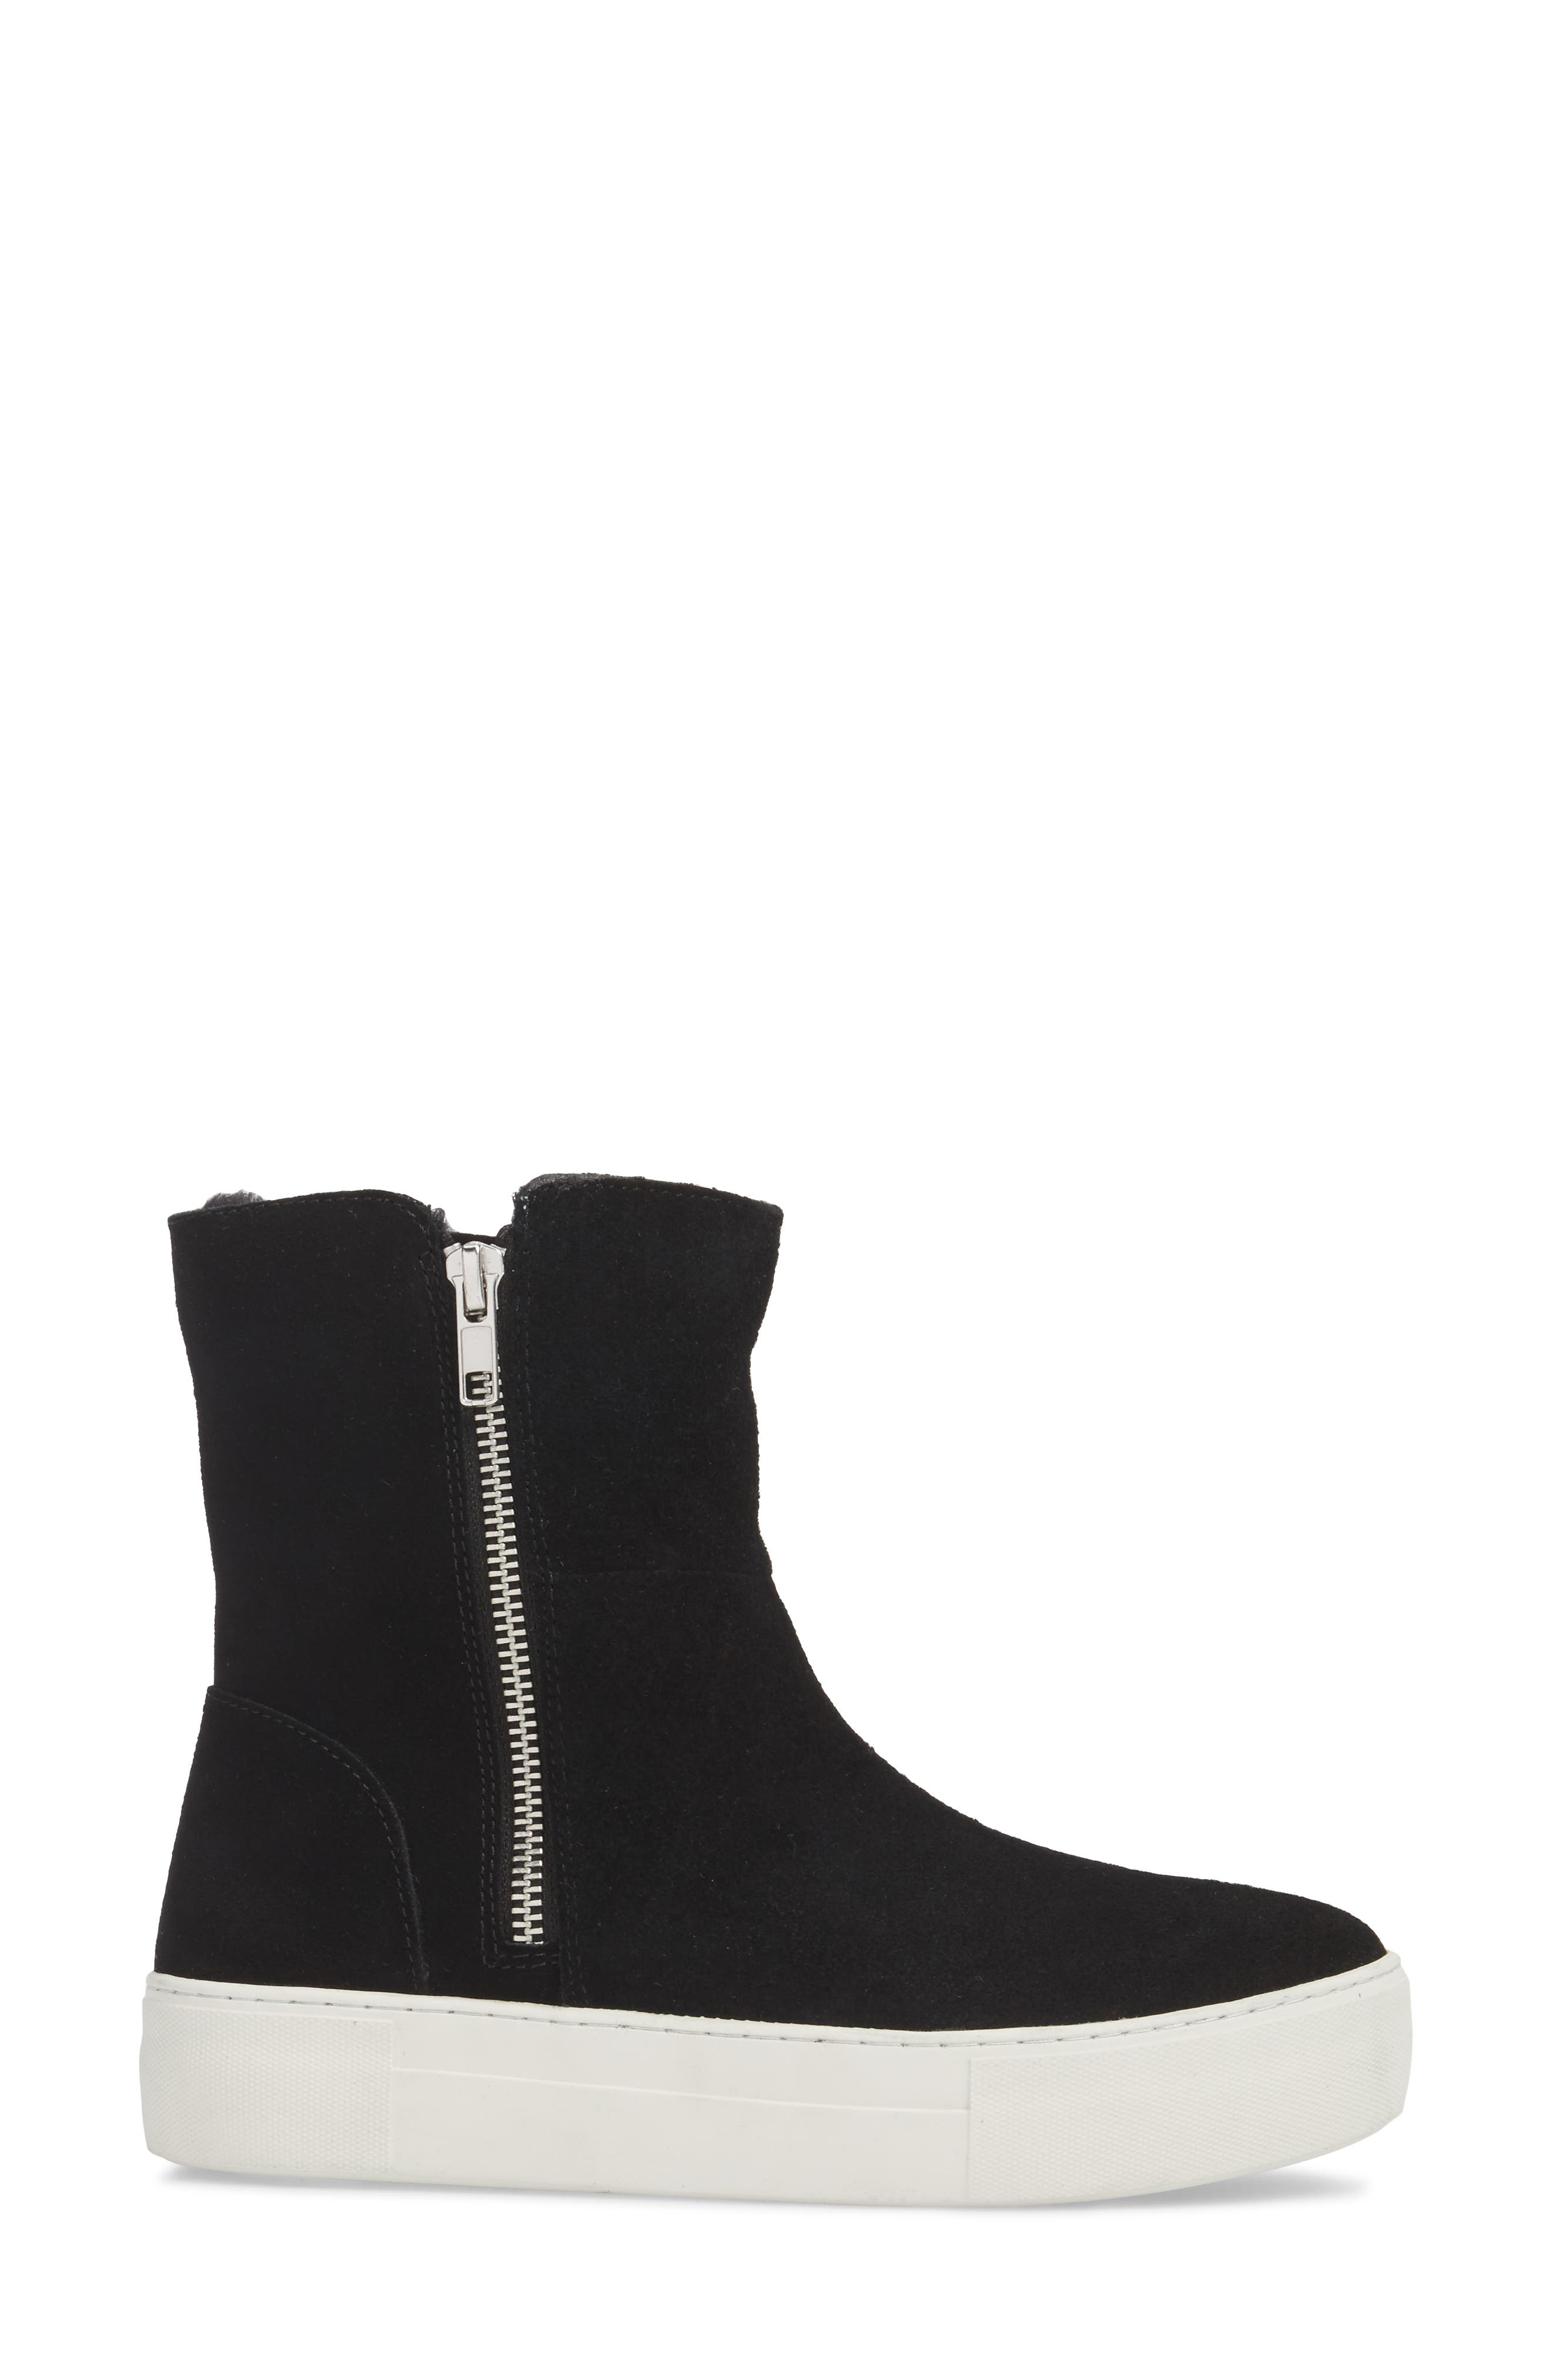 Garrson Sneaker Boot,                             Alternate thumbnail 3, color,                             006